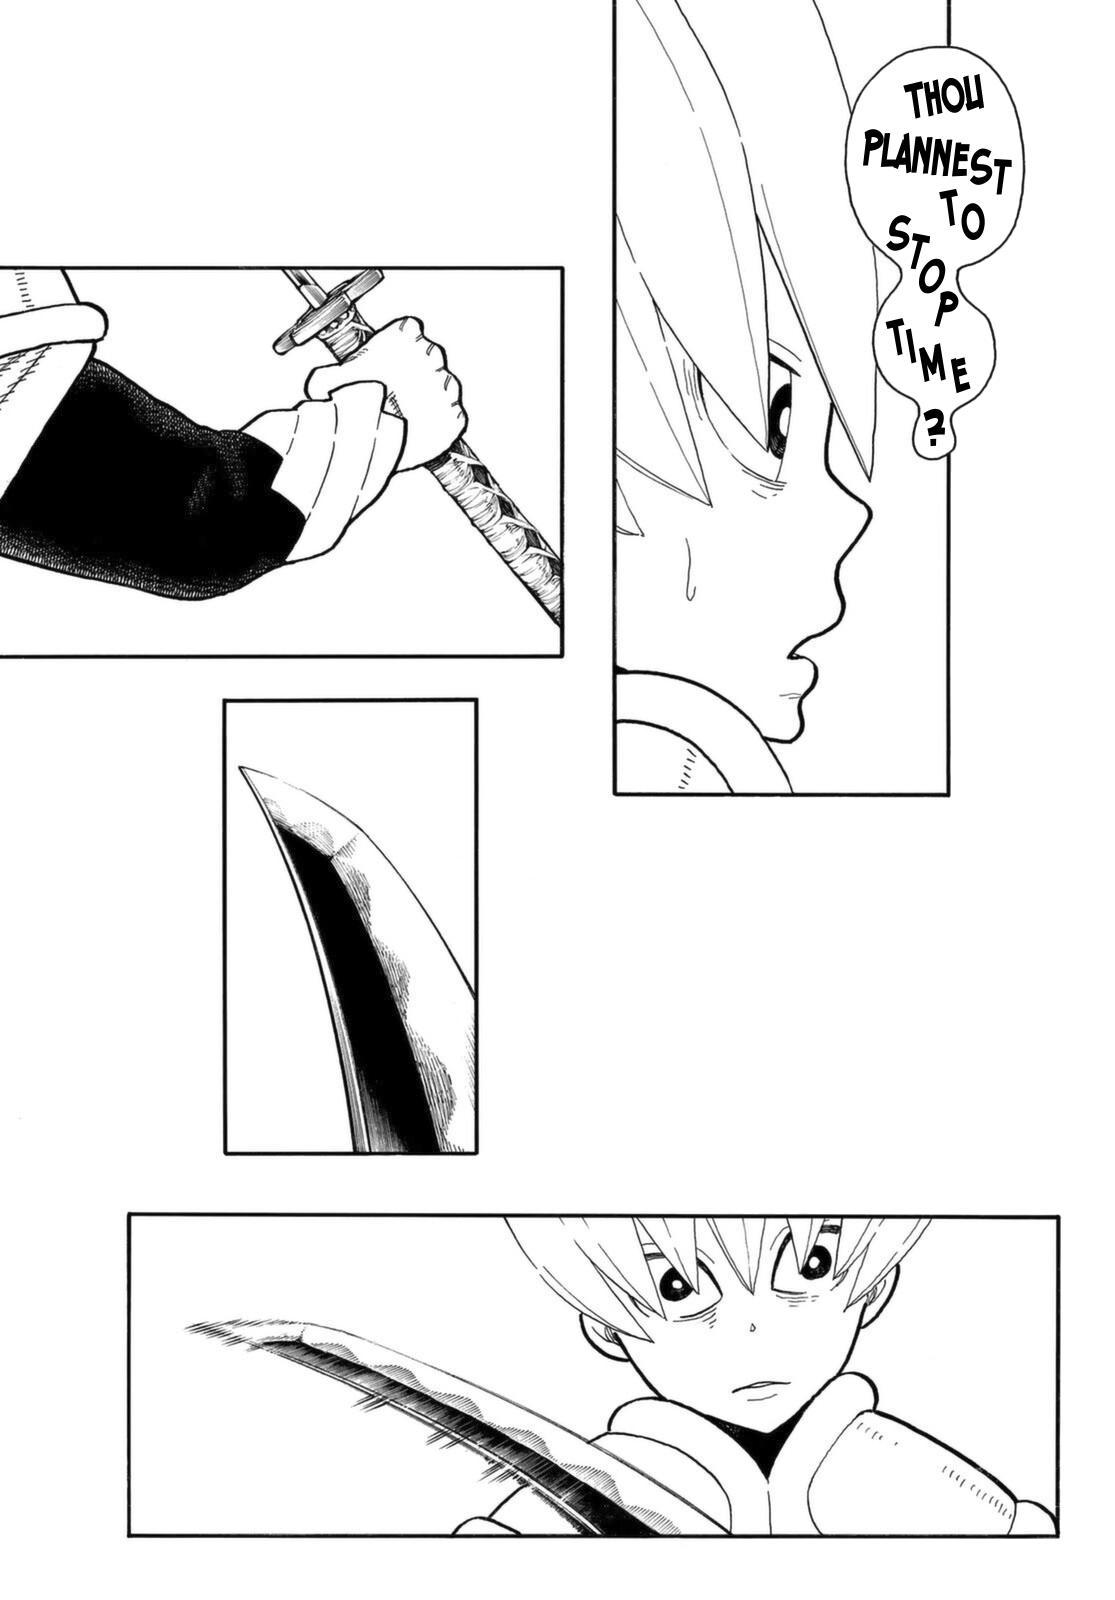 Enen No Shouboutai Chapter 274: The Saviour And The Guardian Angel page 10 - Mangakakalots.com